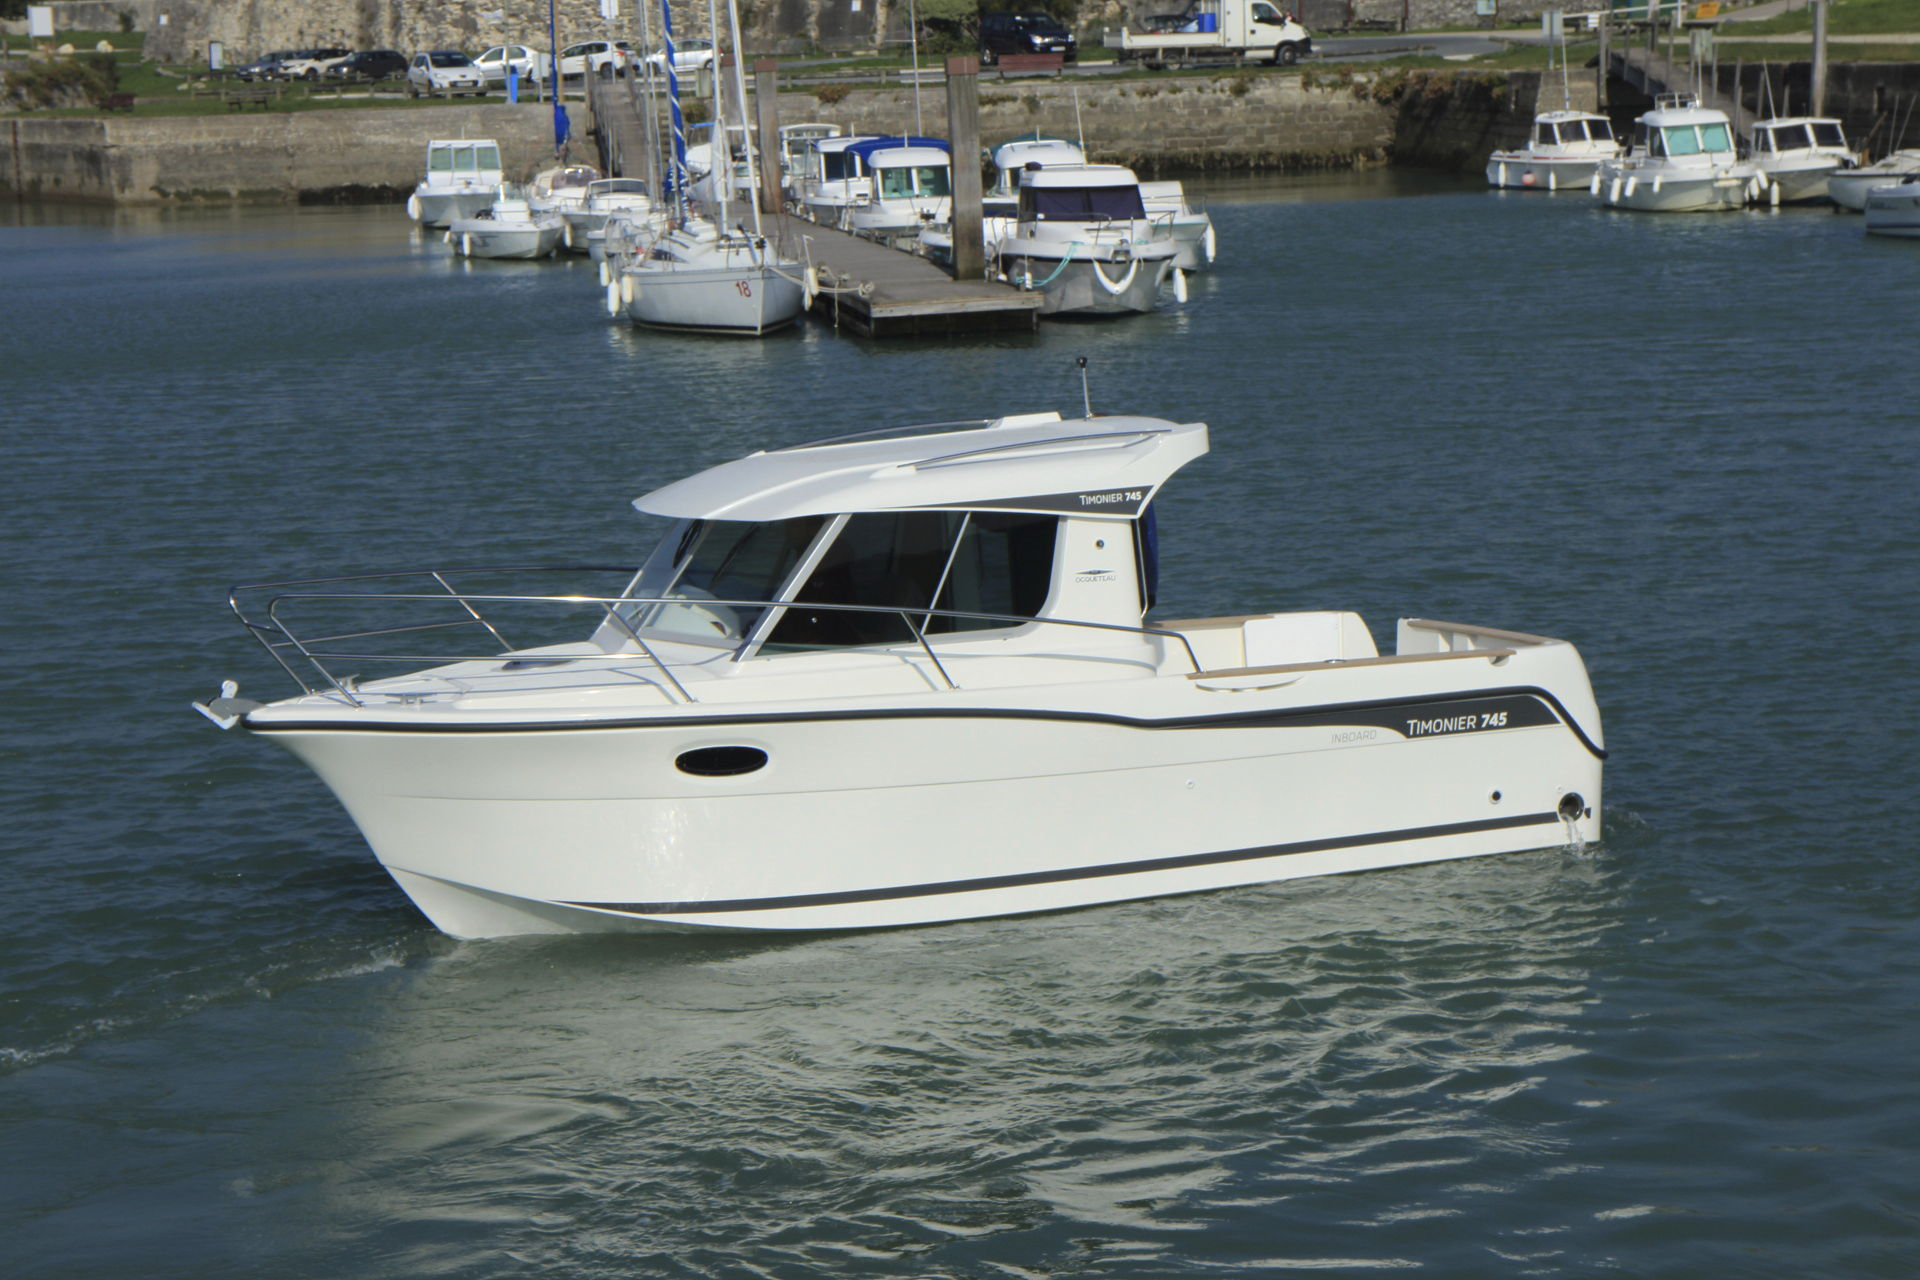 bateau peche timonier